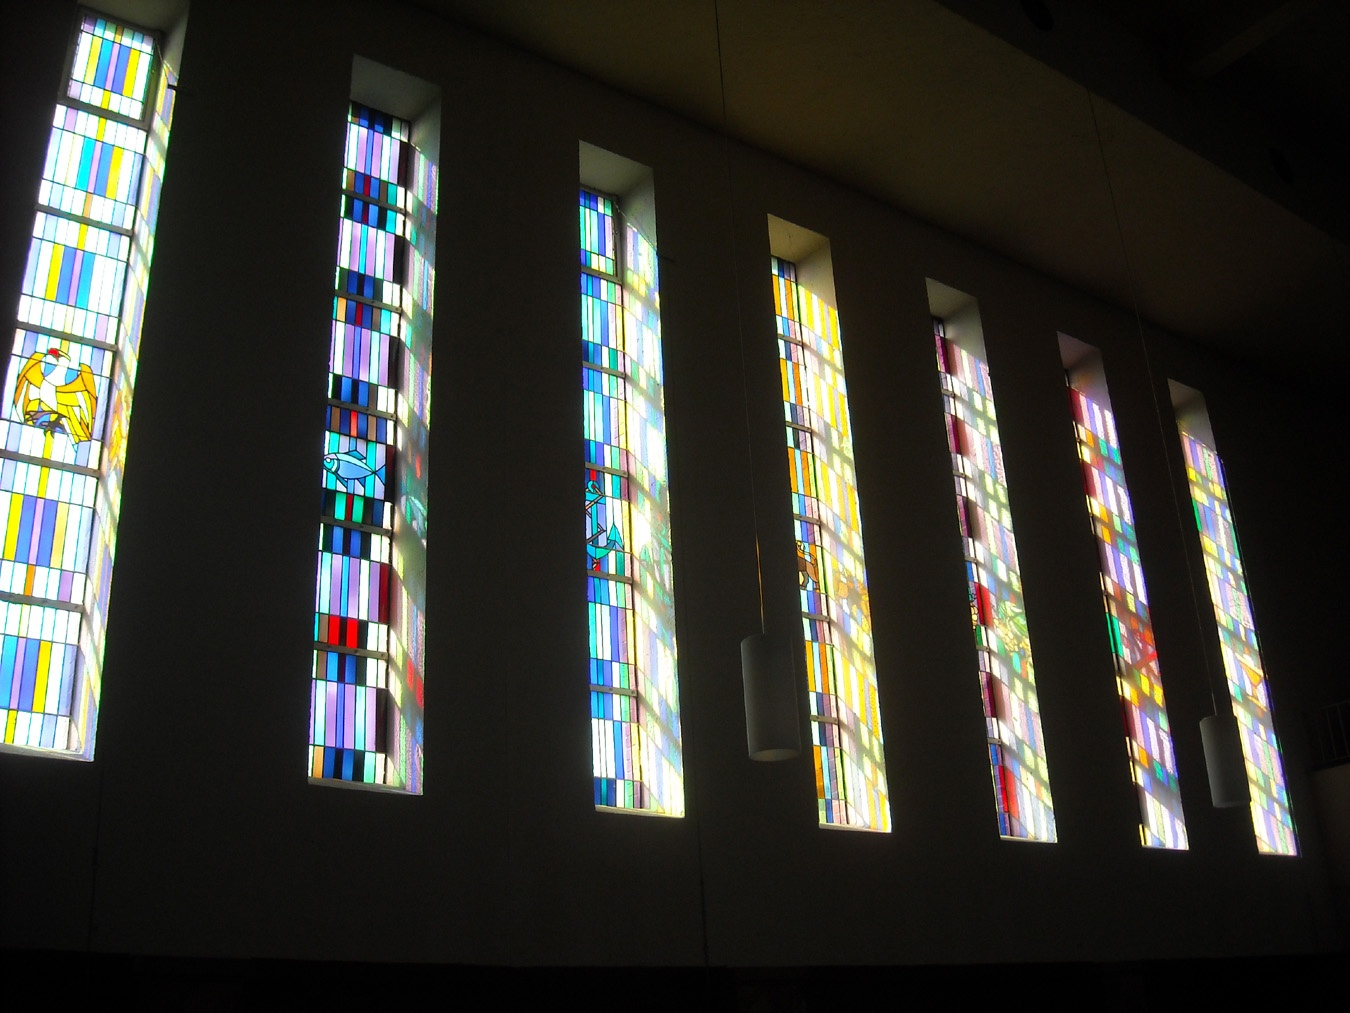 Fenster in der Klarenthaler Kirche